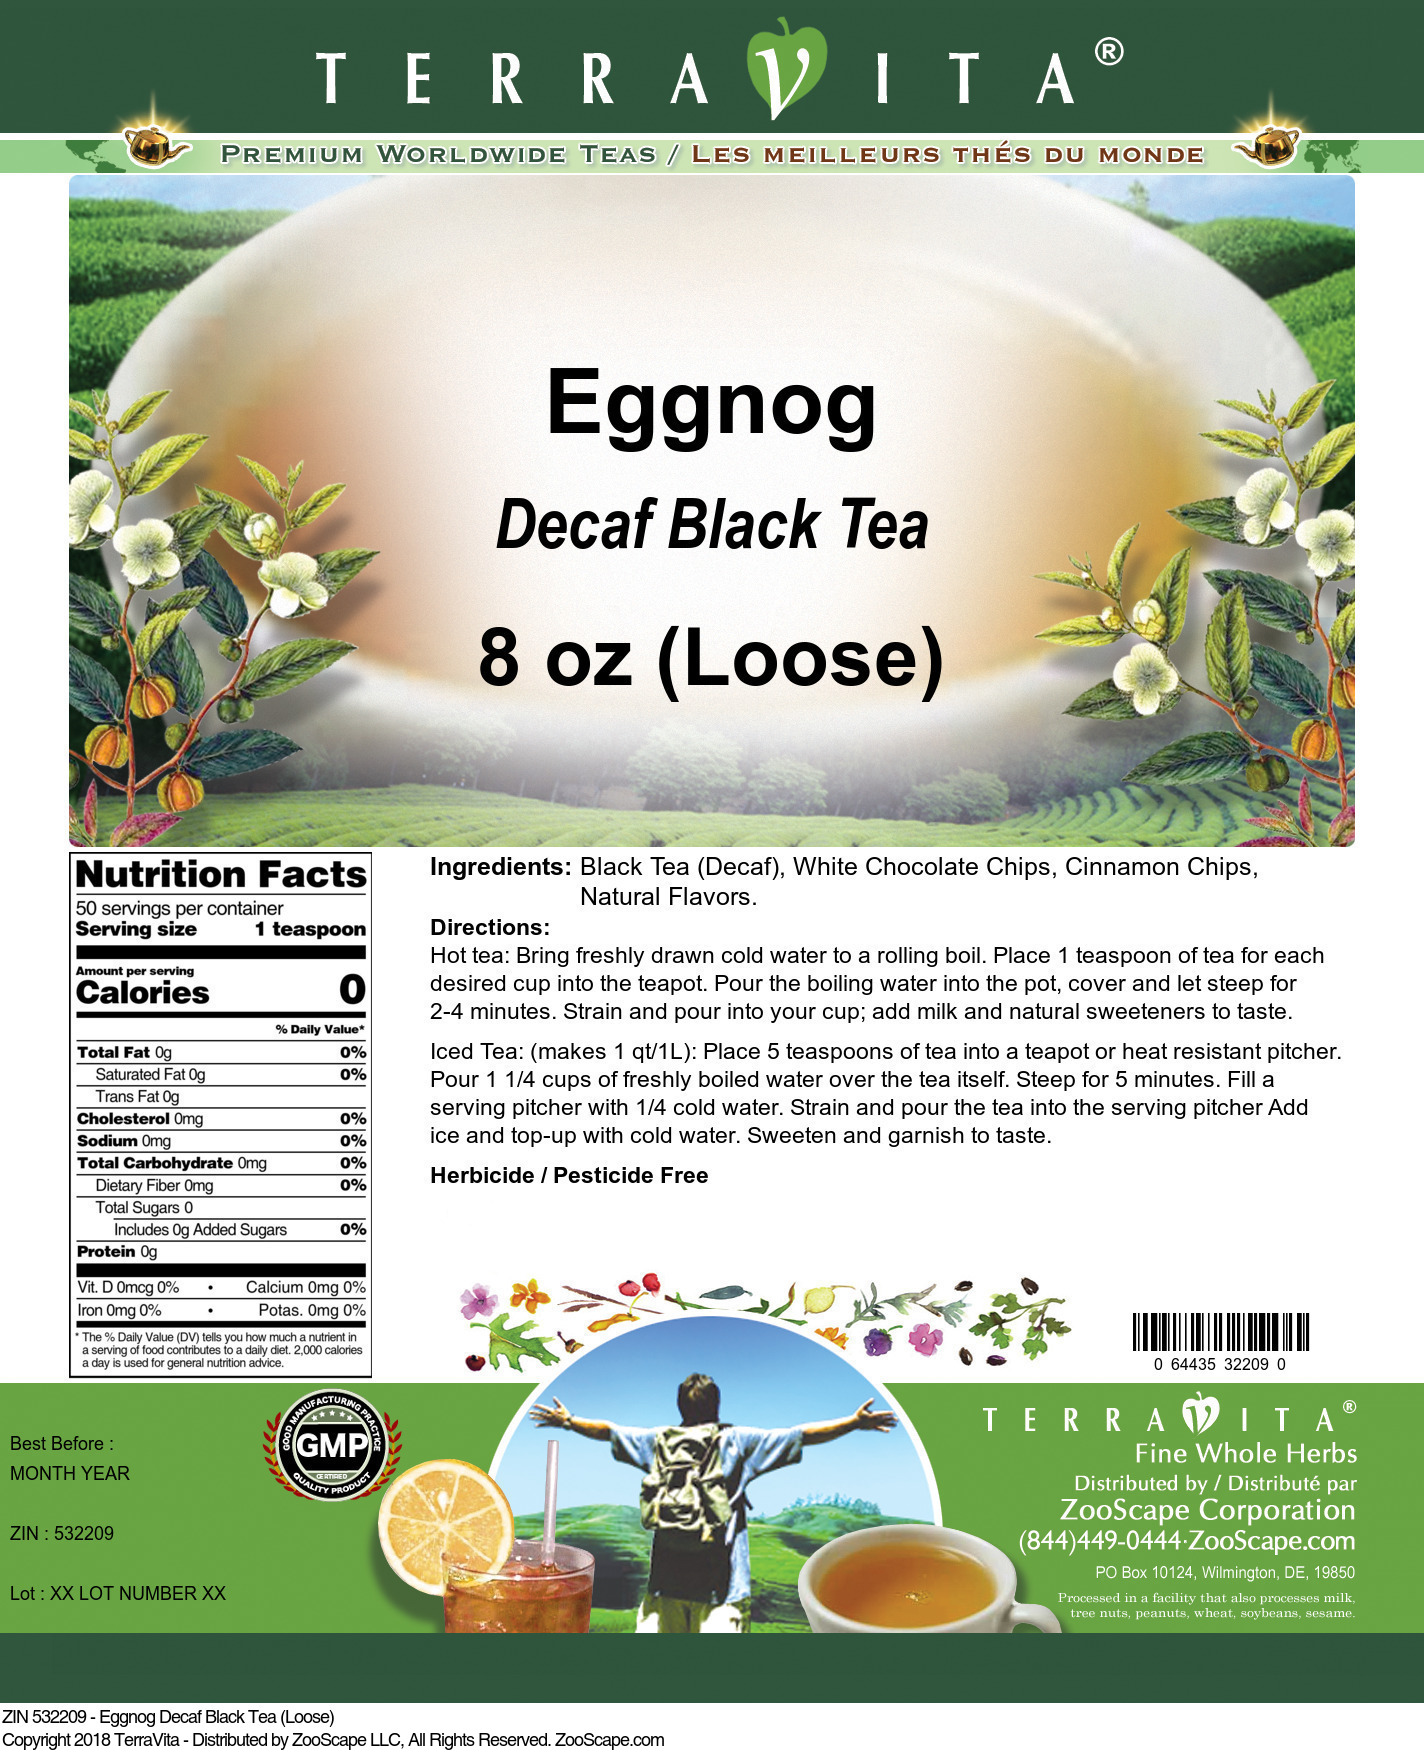 Eggnog Decaf Black Tea